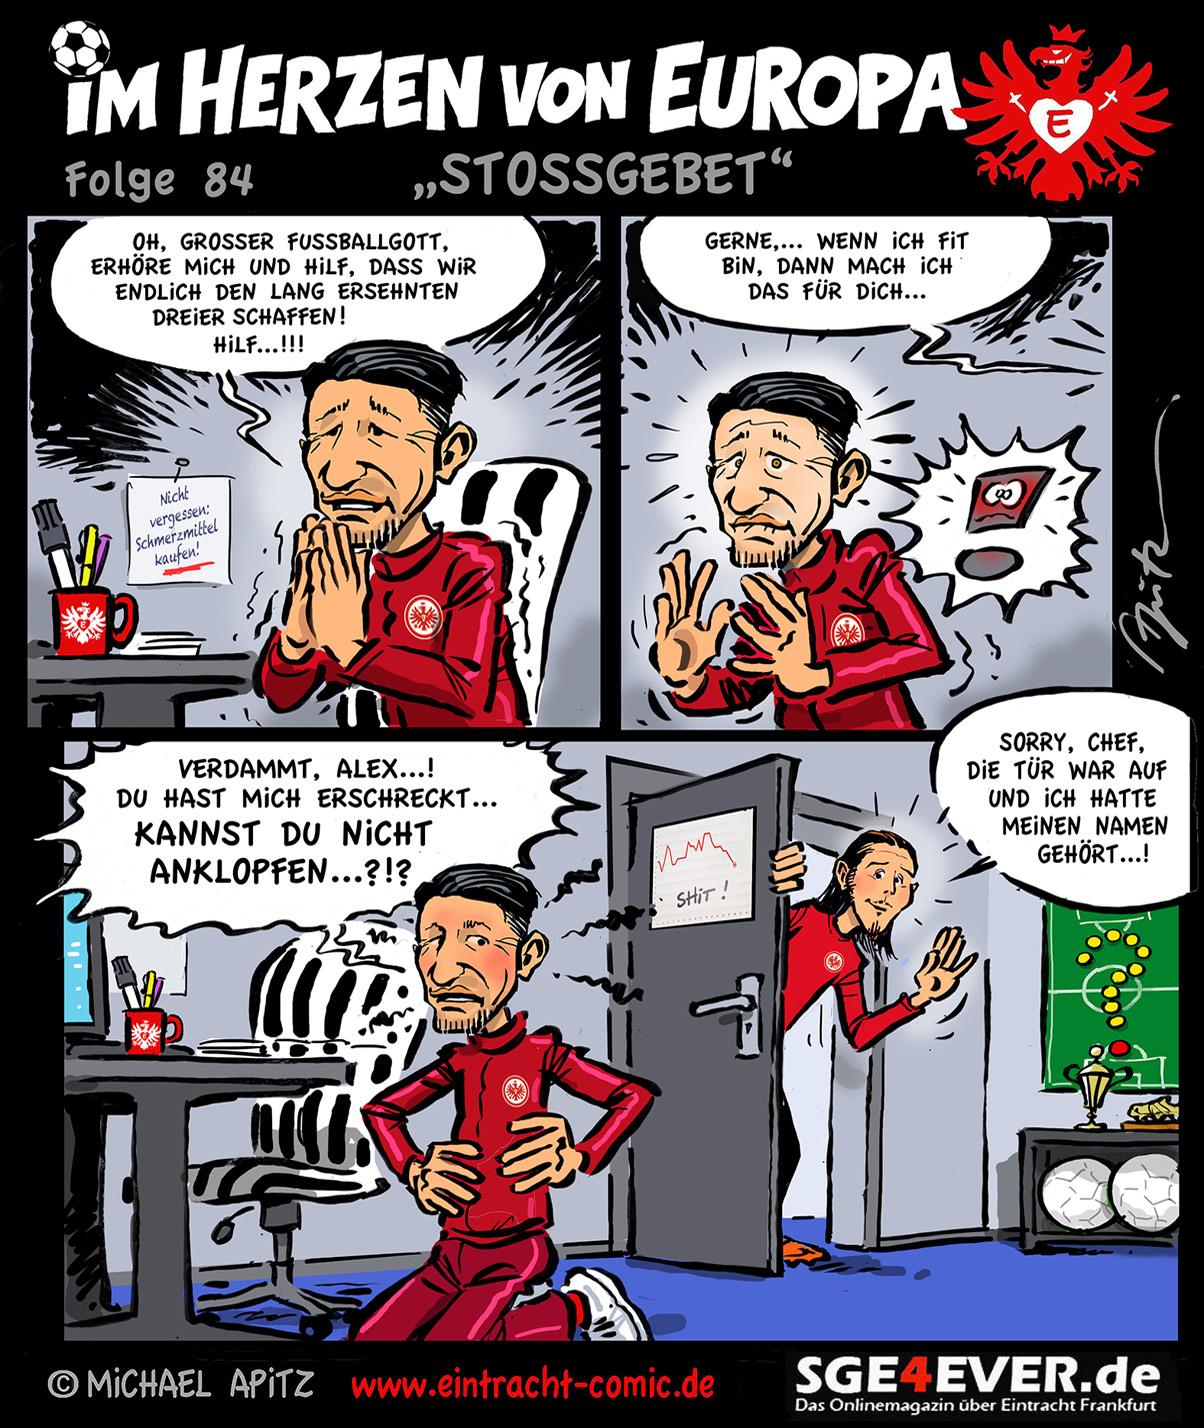 Spieltagscomic Stossgebet Sge4ever De Das Onlinemagazin Uber Eintracht Frankfurt